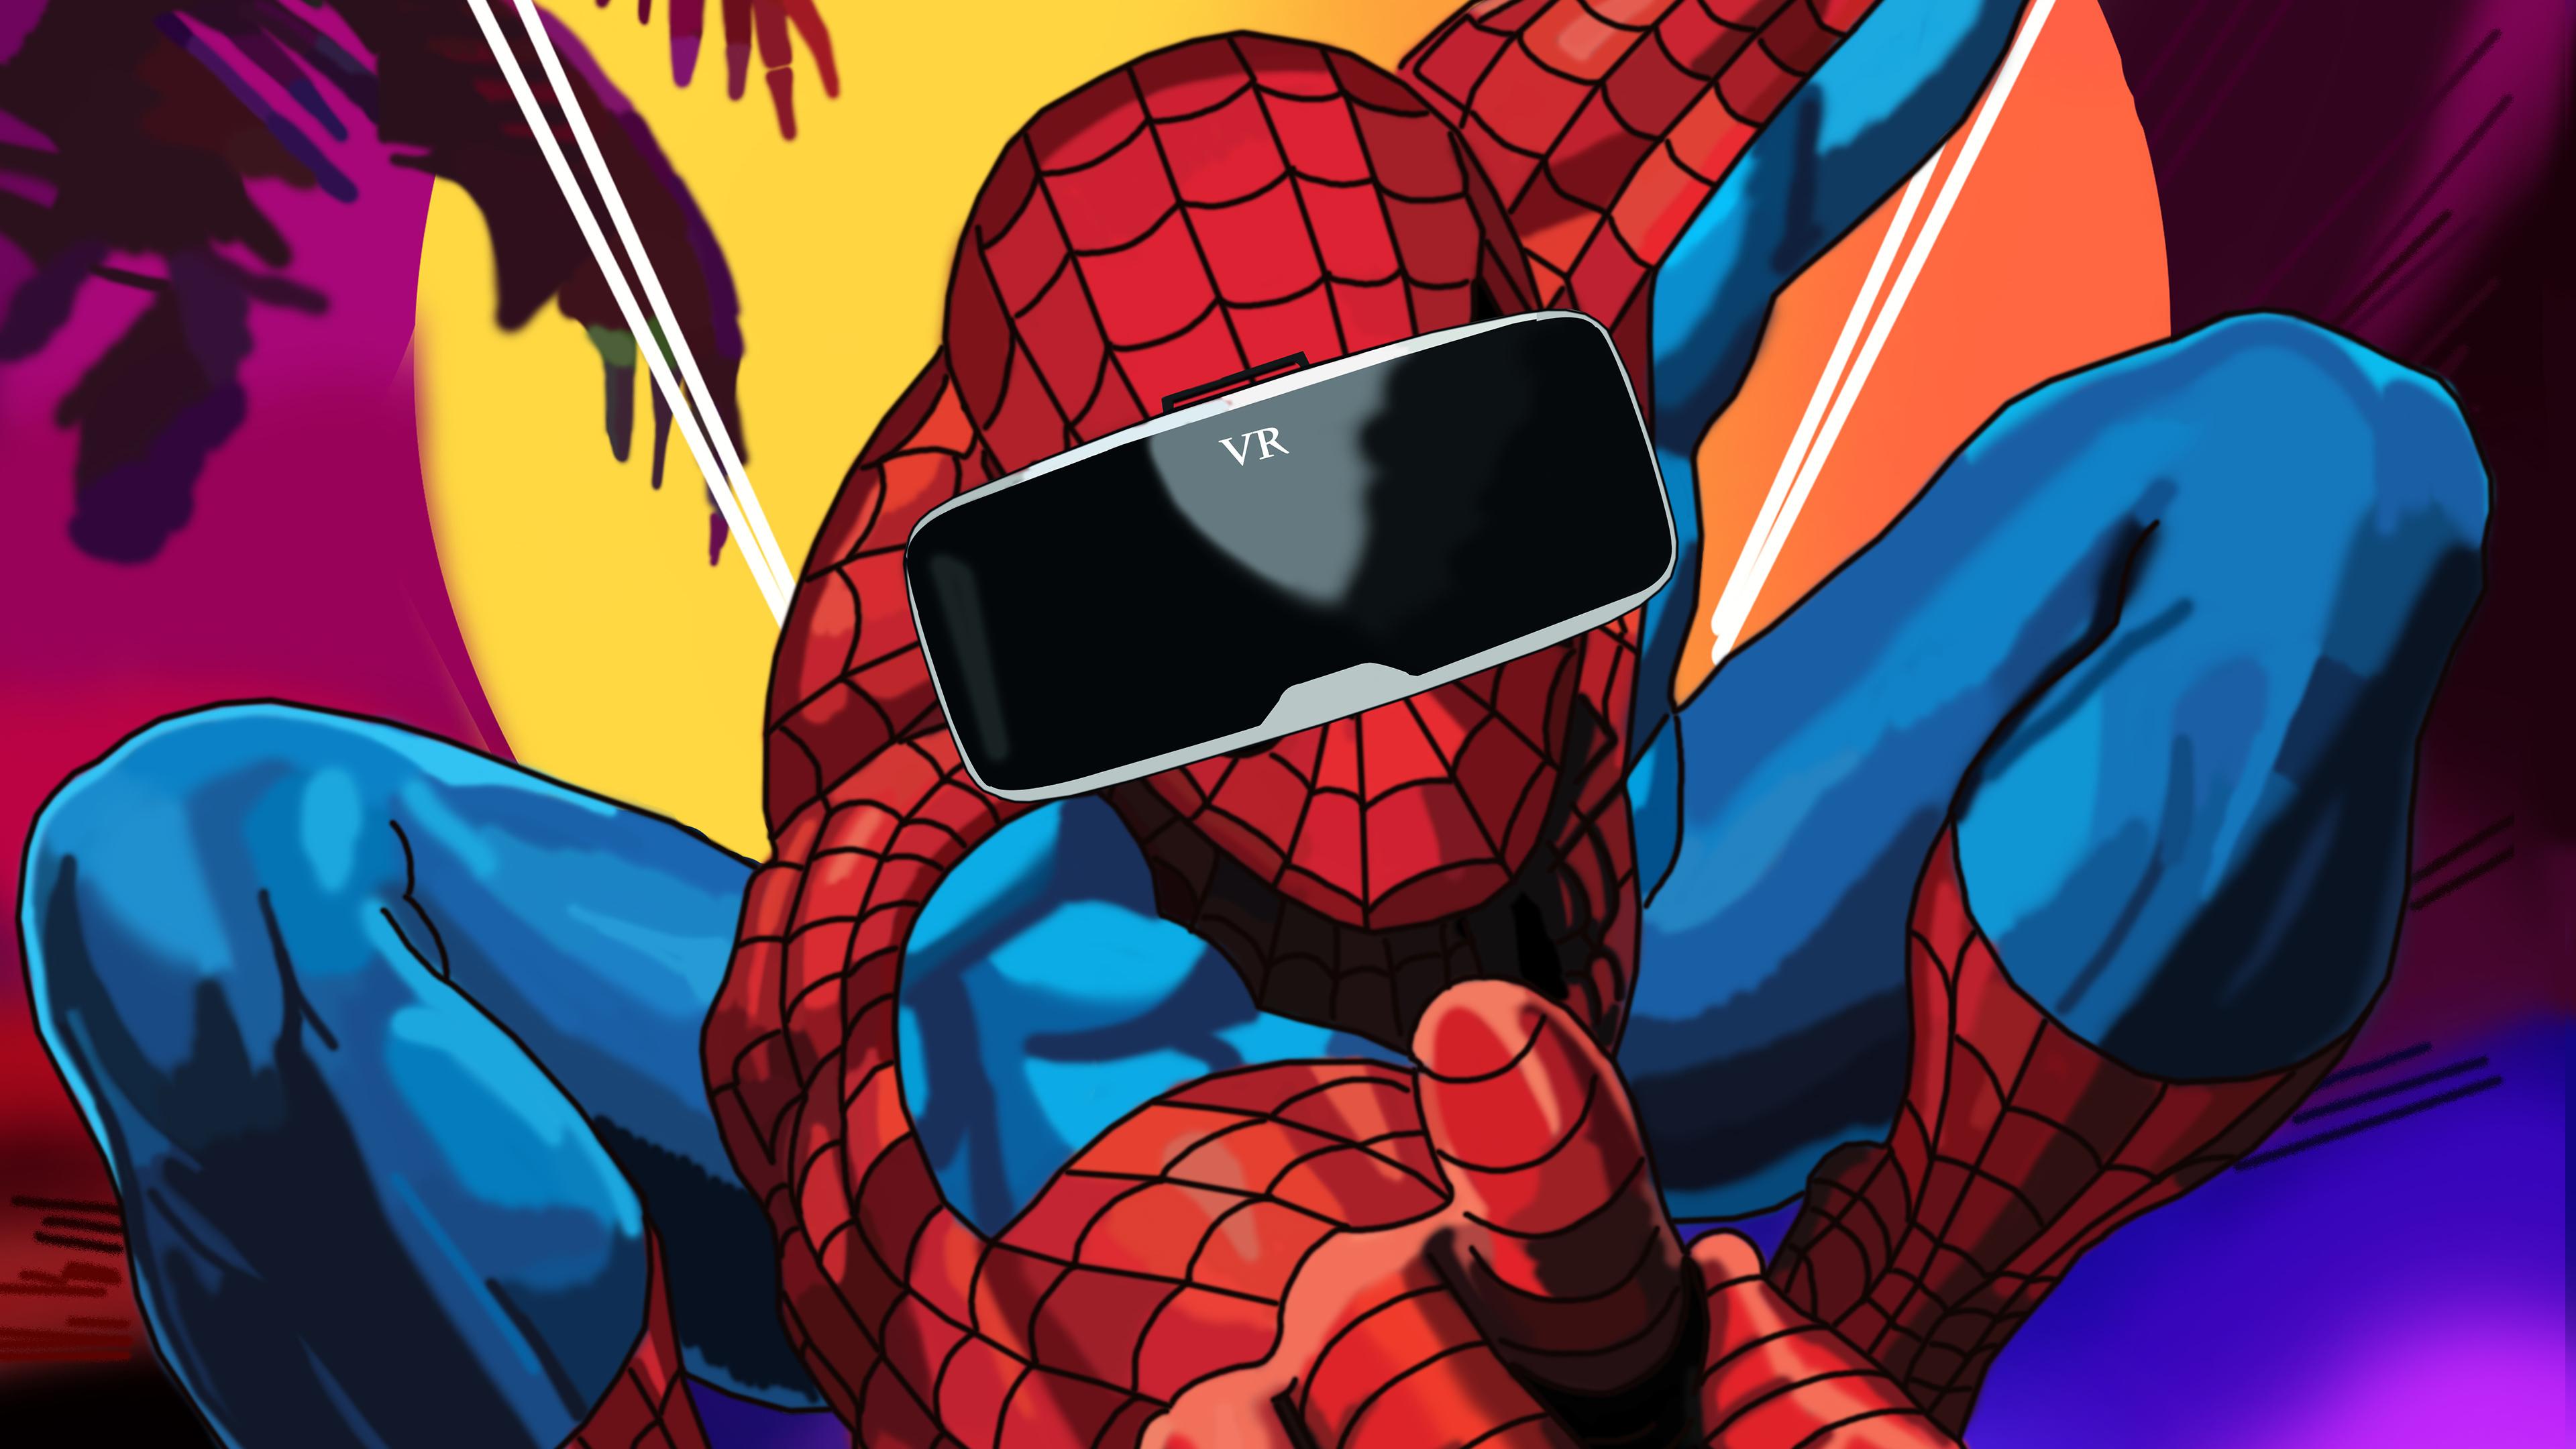 spiderman using vr headset 4k 1550510709 - Spiderman Using VR Headset 4k - superheroes wallpapers, spiderman wallpapers, hd-wallpapers, digital art wallpapers, behance wallpapers, artwork wallpapers, artist wallpapers, 4k-wallpapers